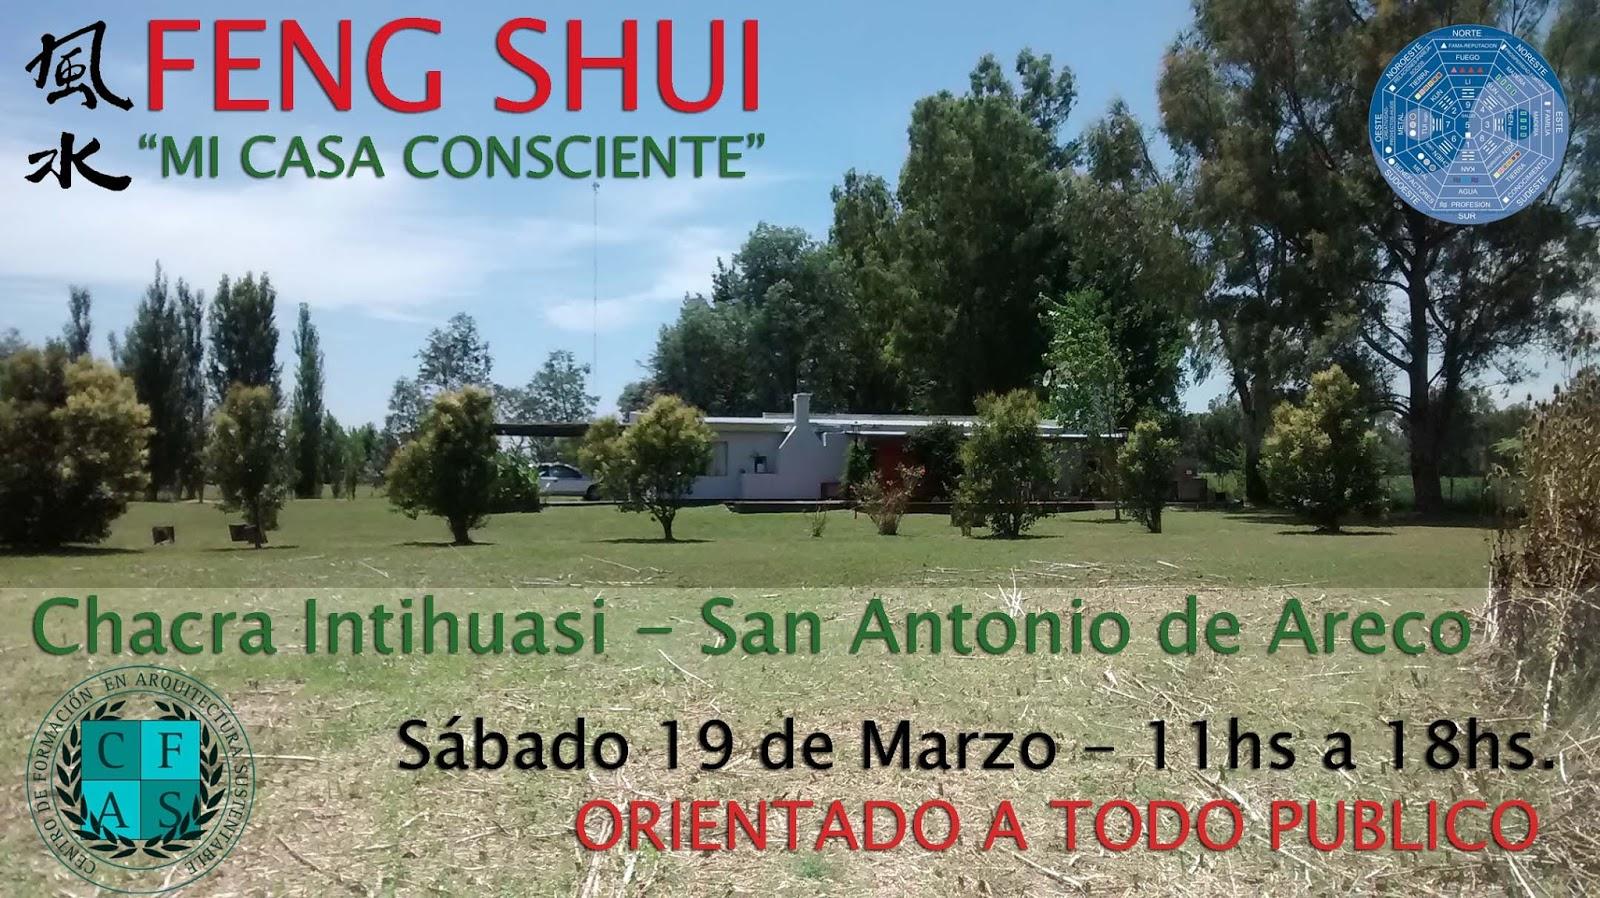 Arquitectura y feng shui taller de feng shui en san antonio de areco - Arquitectura y feng shui ...